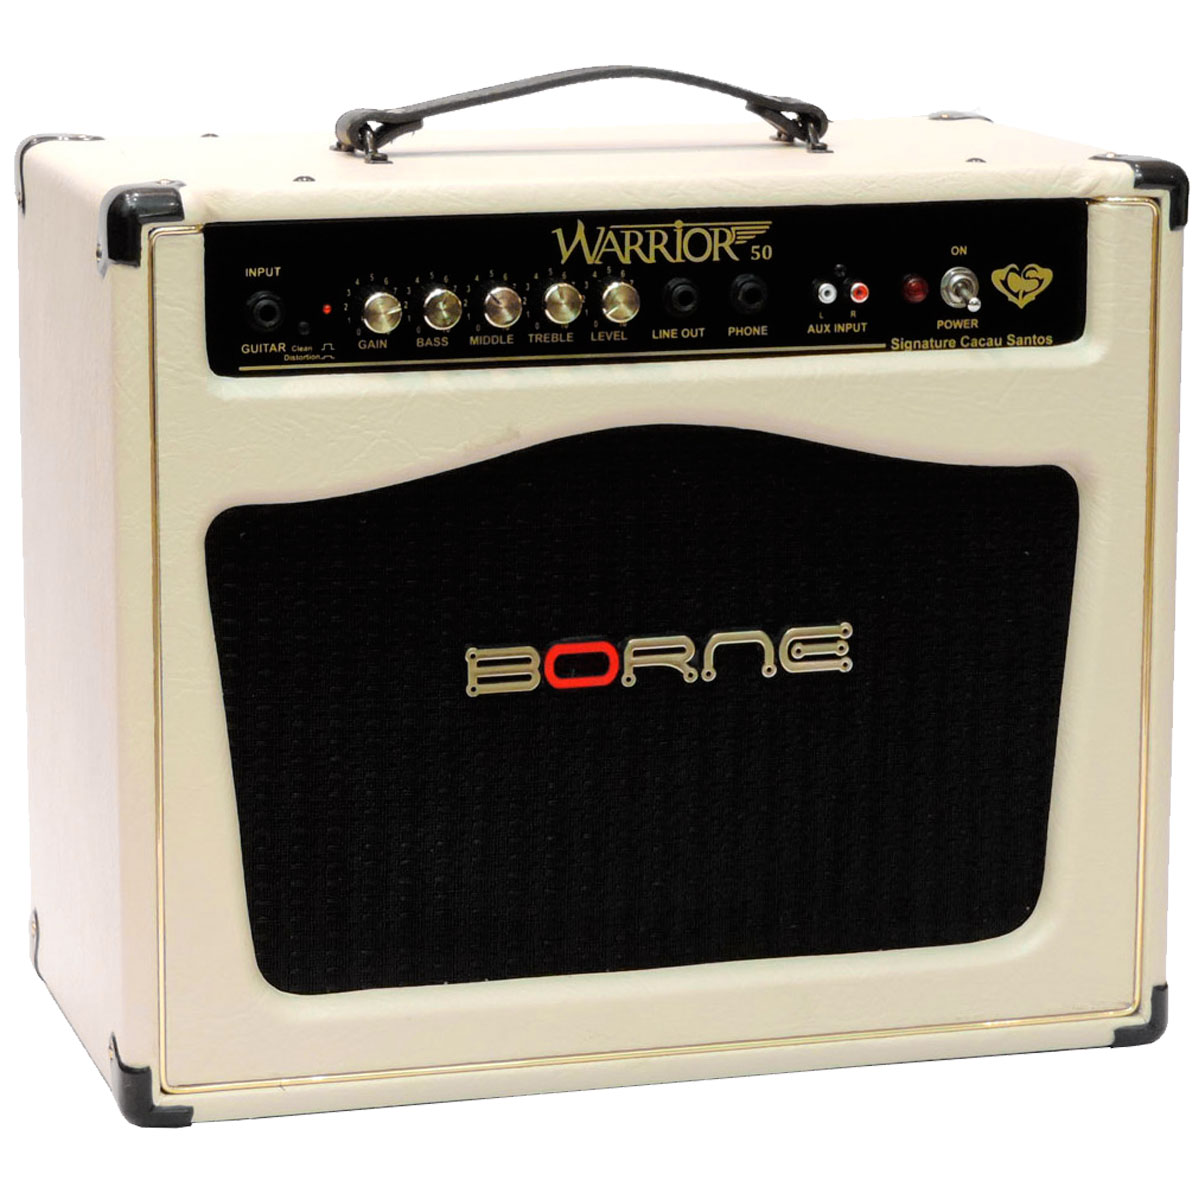 Amplificador Combo p/ Guitarra 50W Warrior 50 Creme - Borne